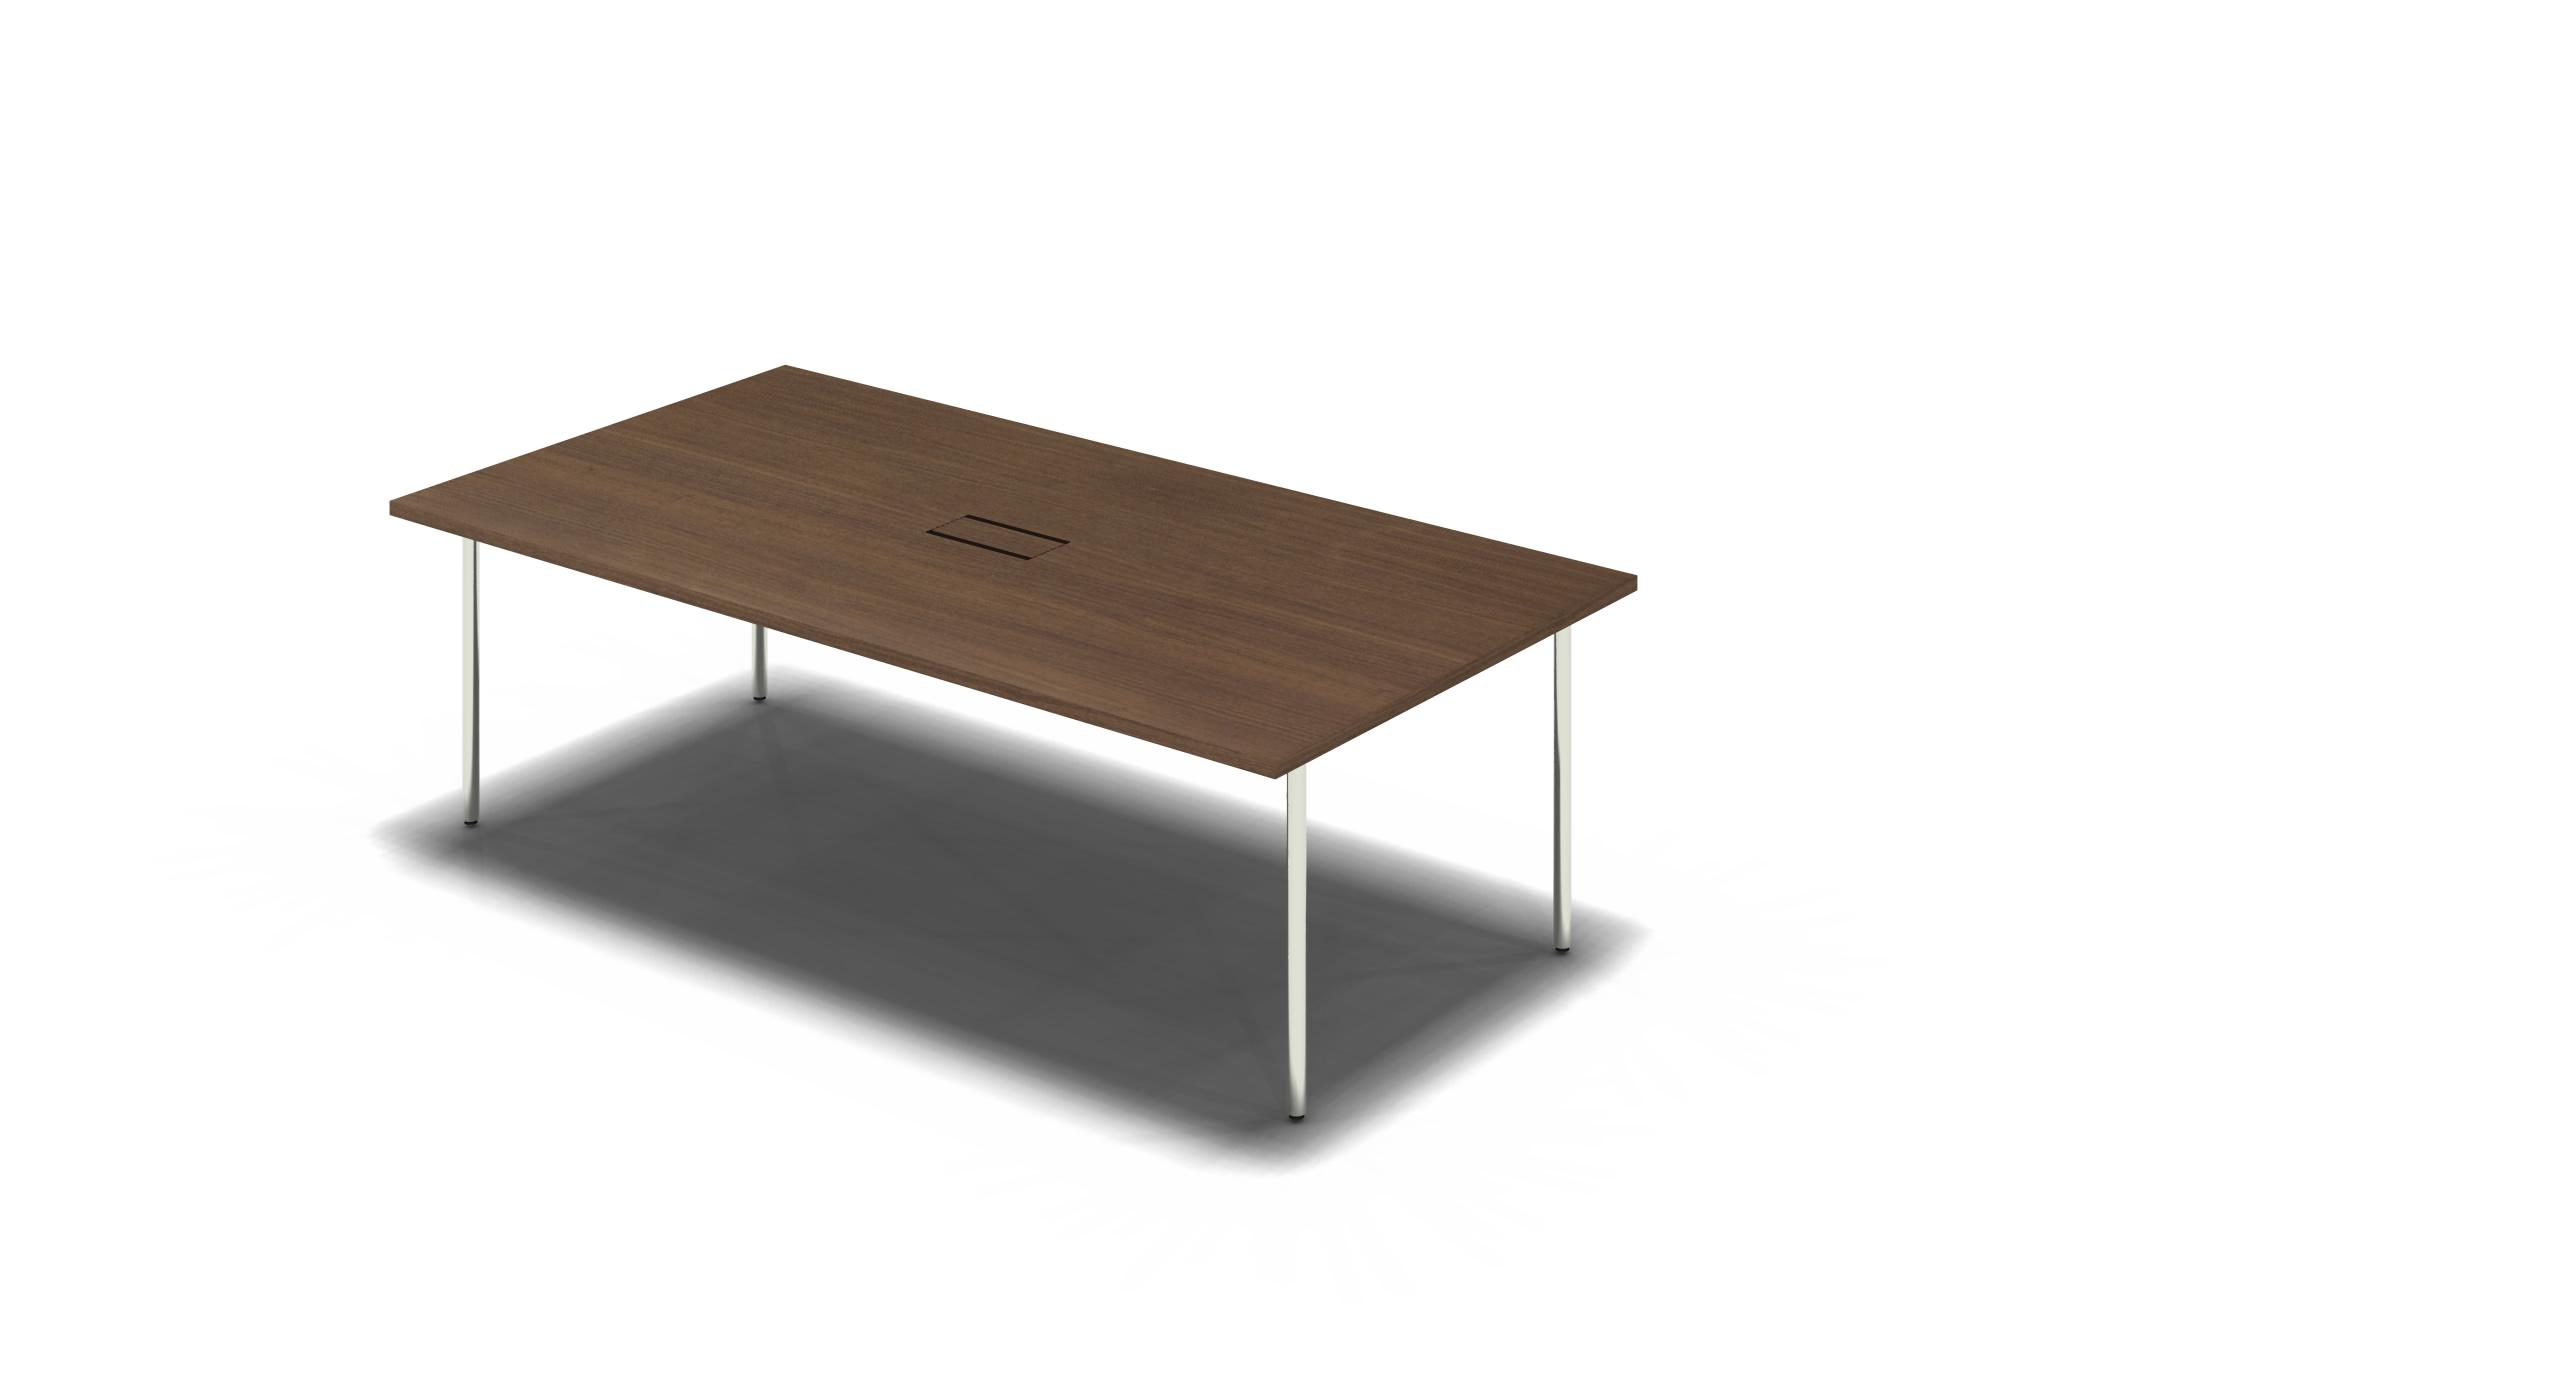 Table_Round_2100x1050_Chrome_Walnut_withOption